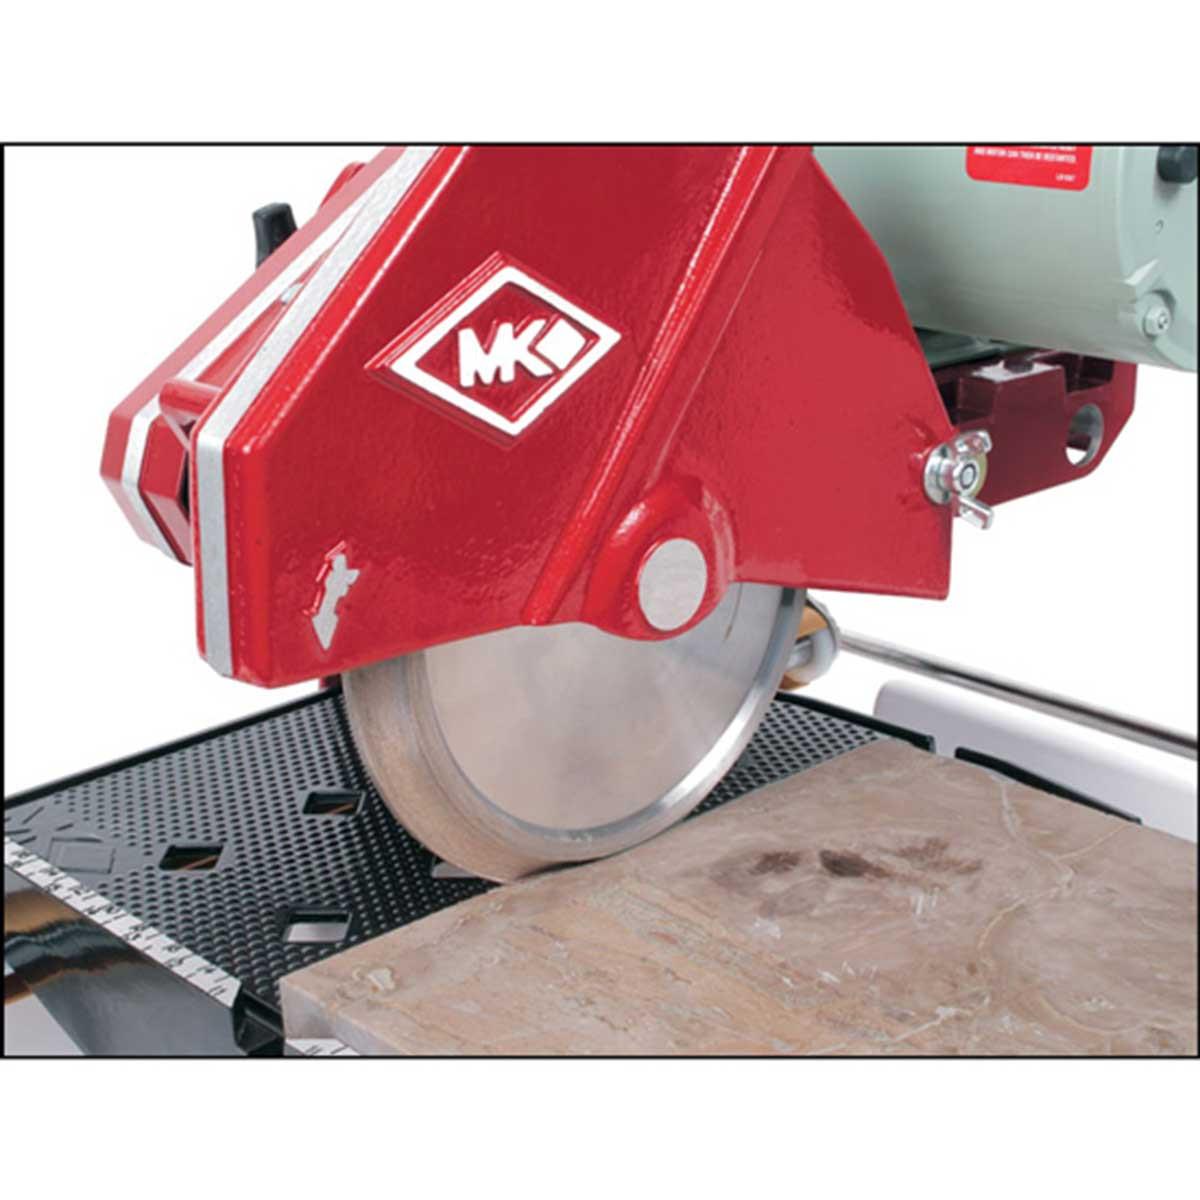 MK-101 Wet Saw stone profile wheel